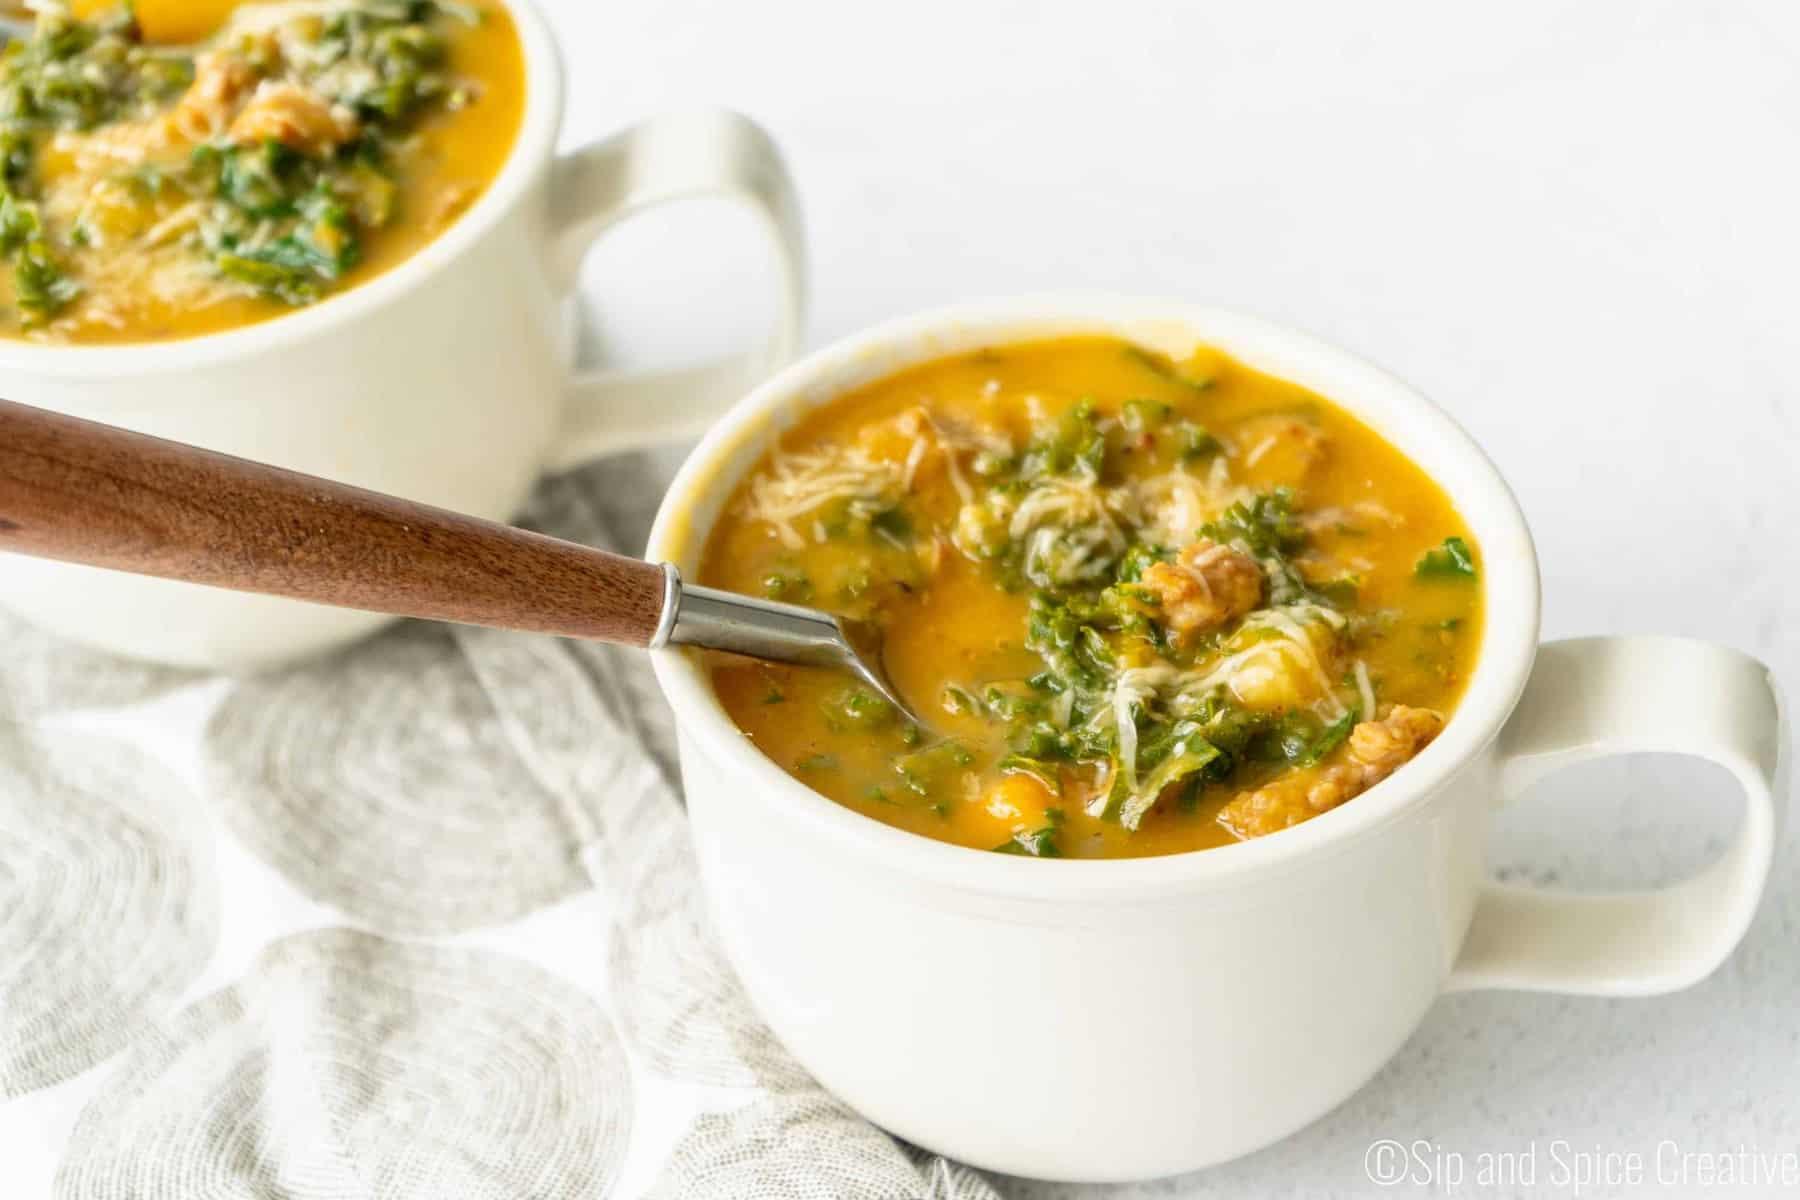 Creamy Sweet Potato Kale Soup with Sausage (Dairy-Free)